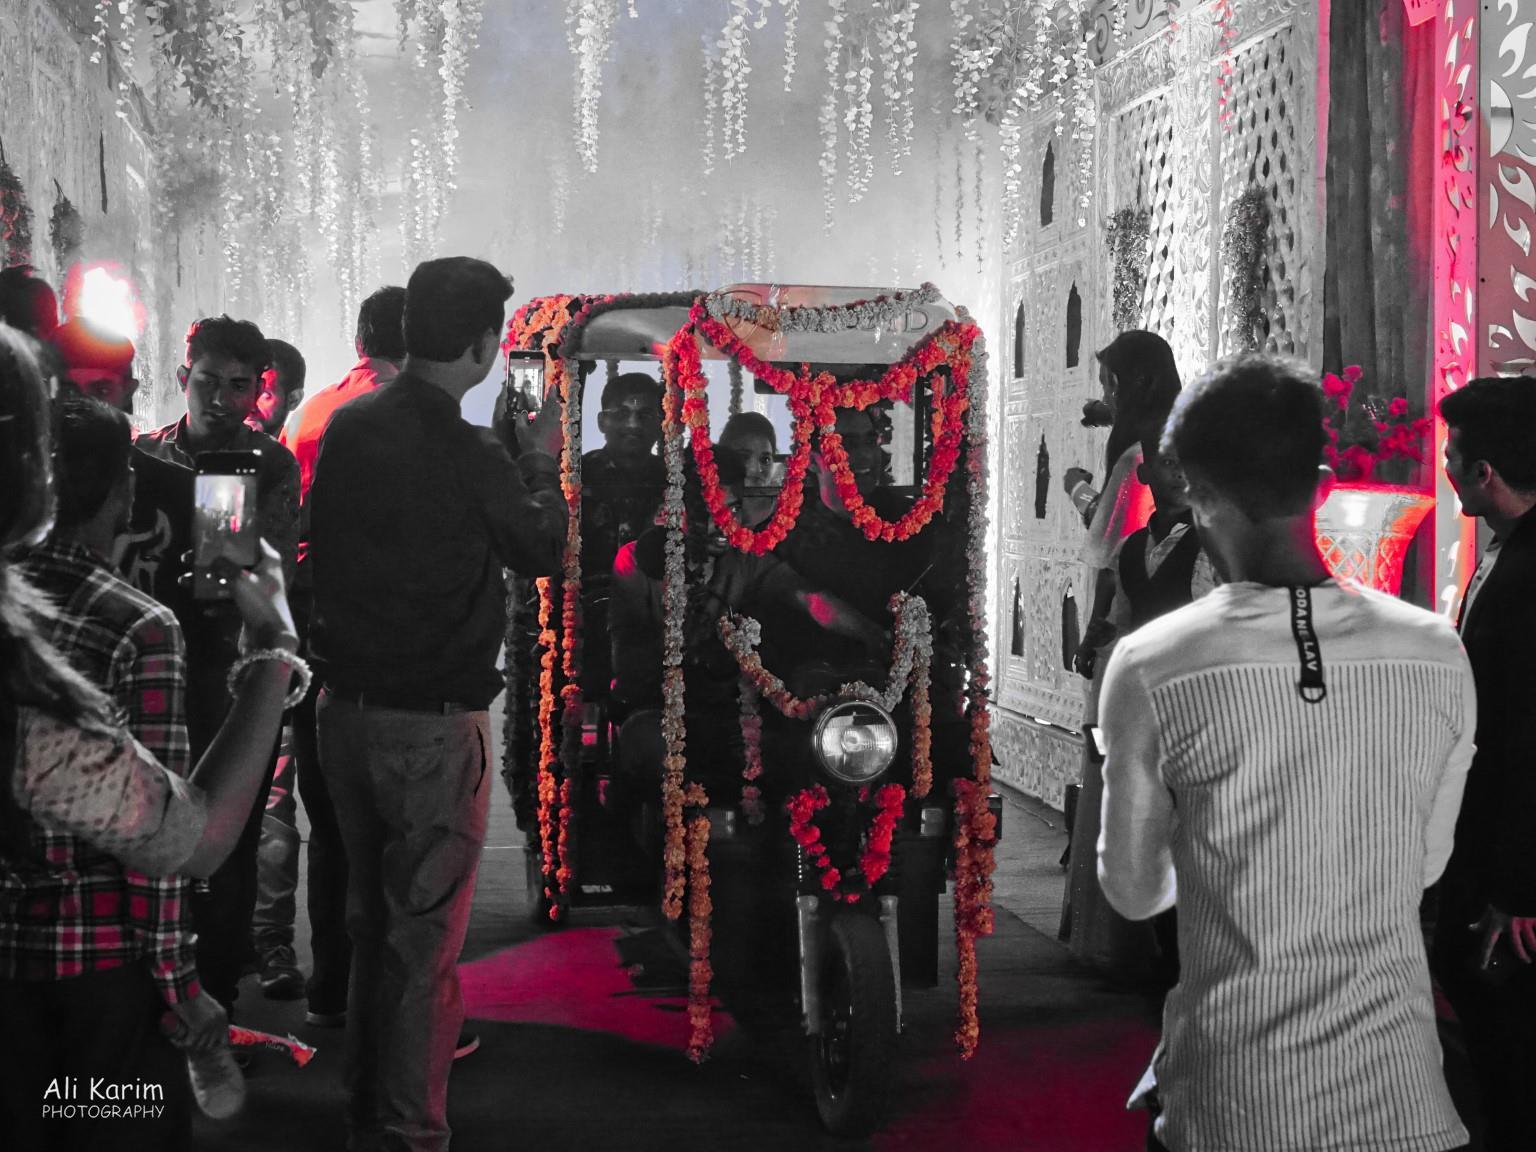 Bikaner, Rajasthan Bride & Groom arriving in a decorated rickshaw